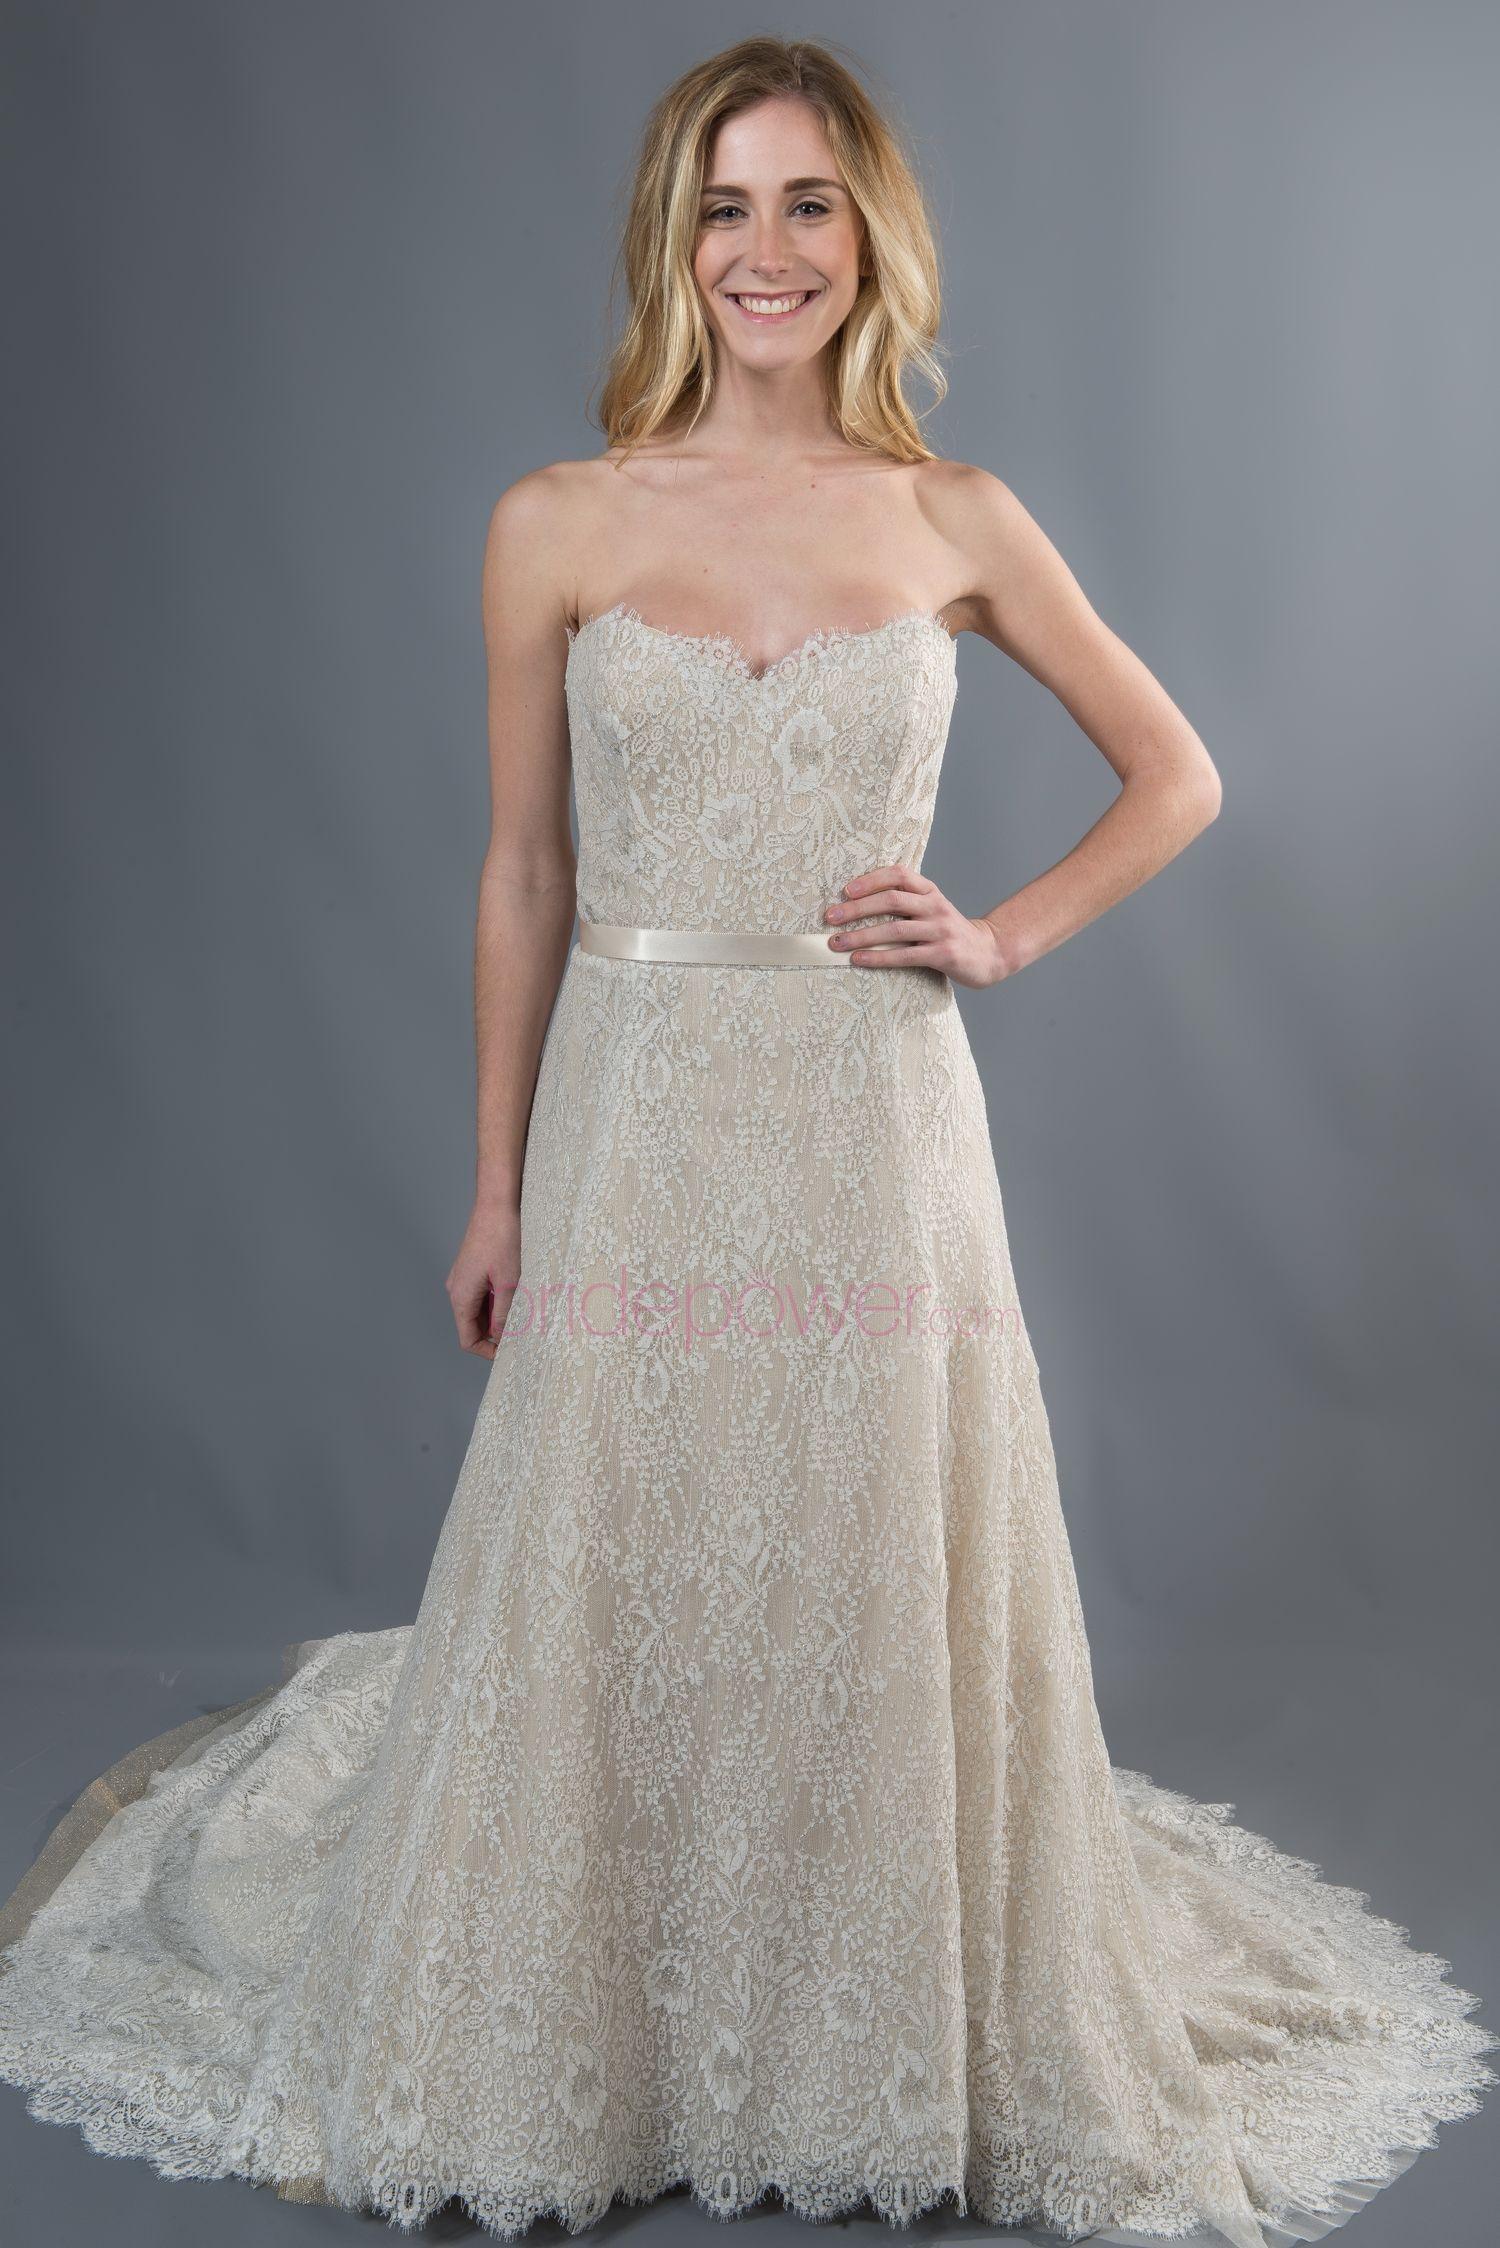 Monique Lhuillier Aline 17741 - https://bridepower.com/product ...